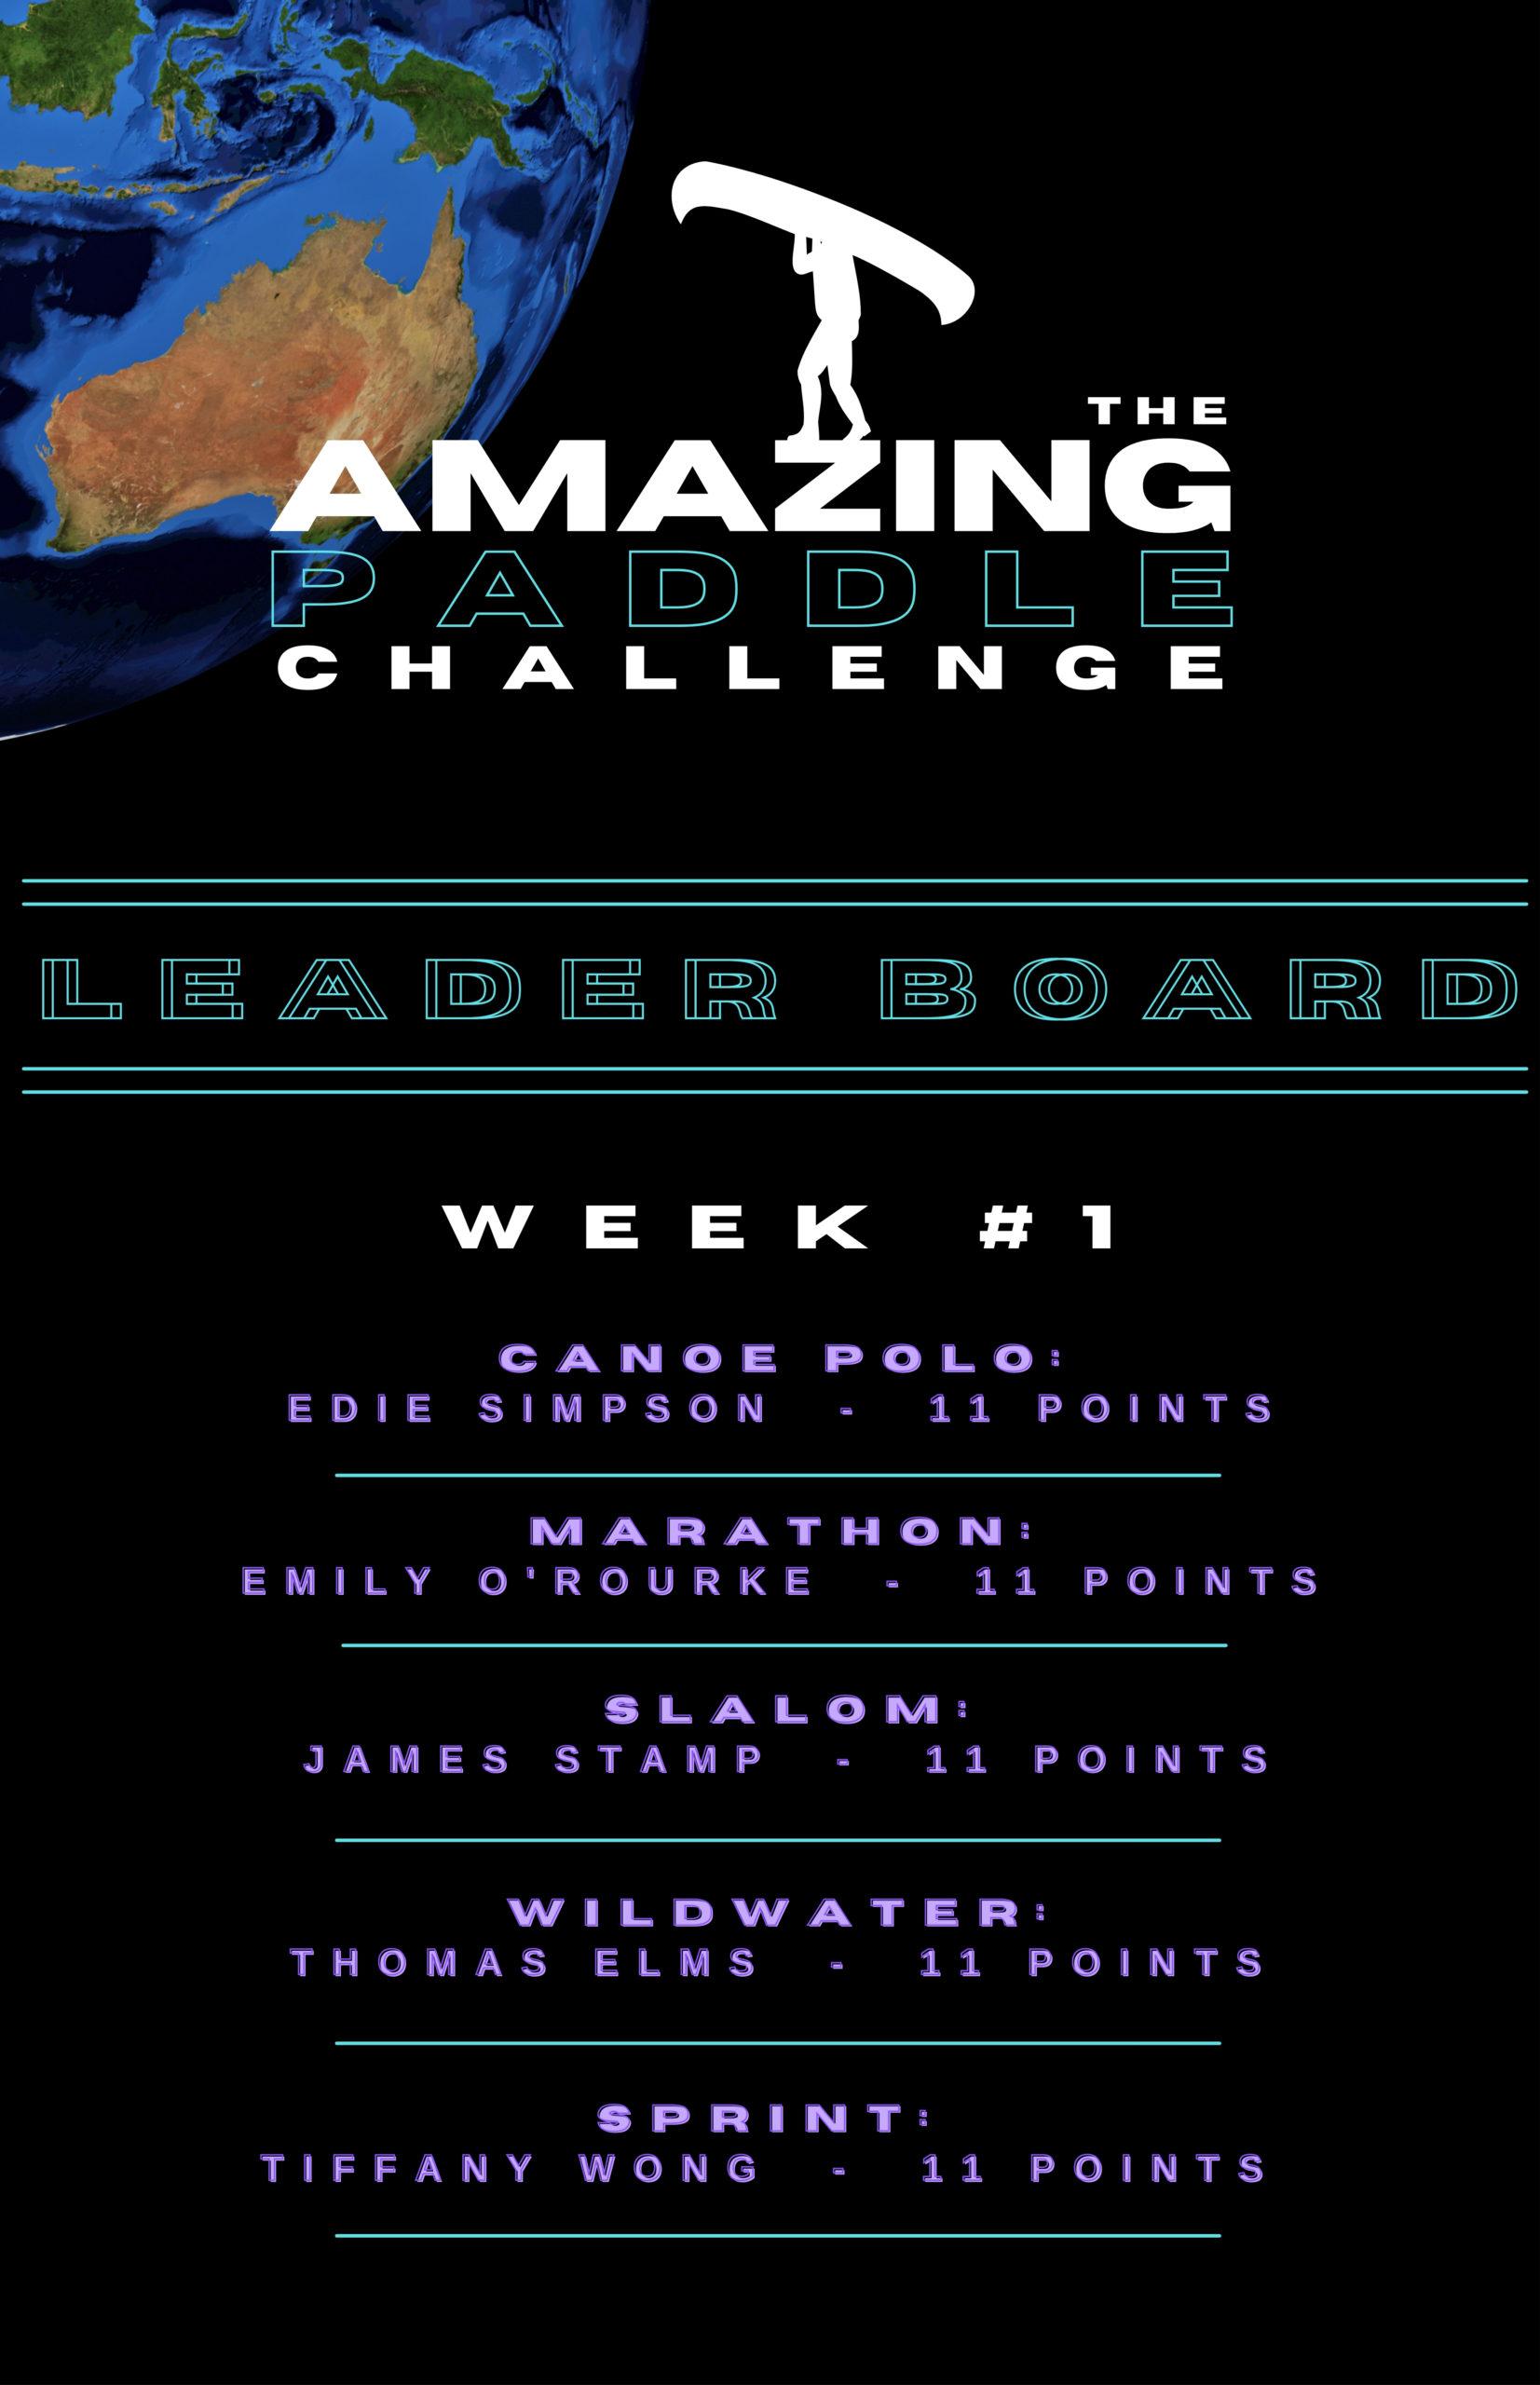 Amazing Paddle Challenge